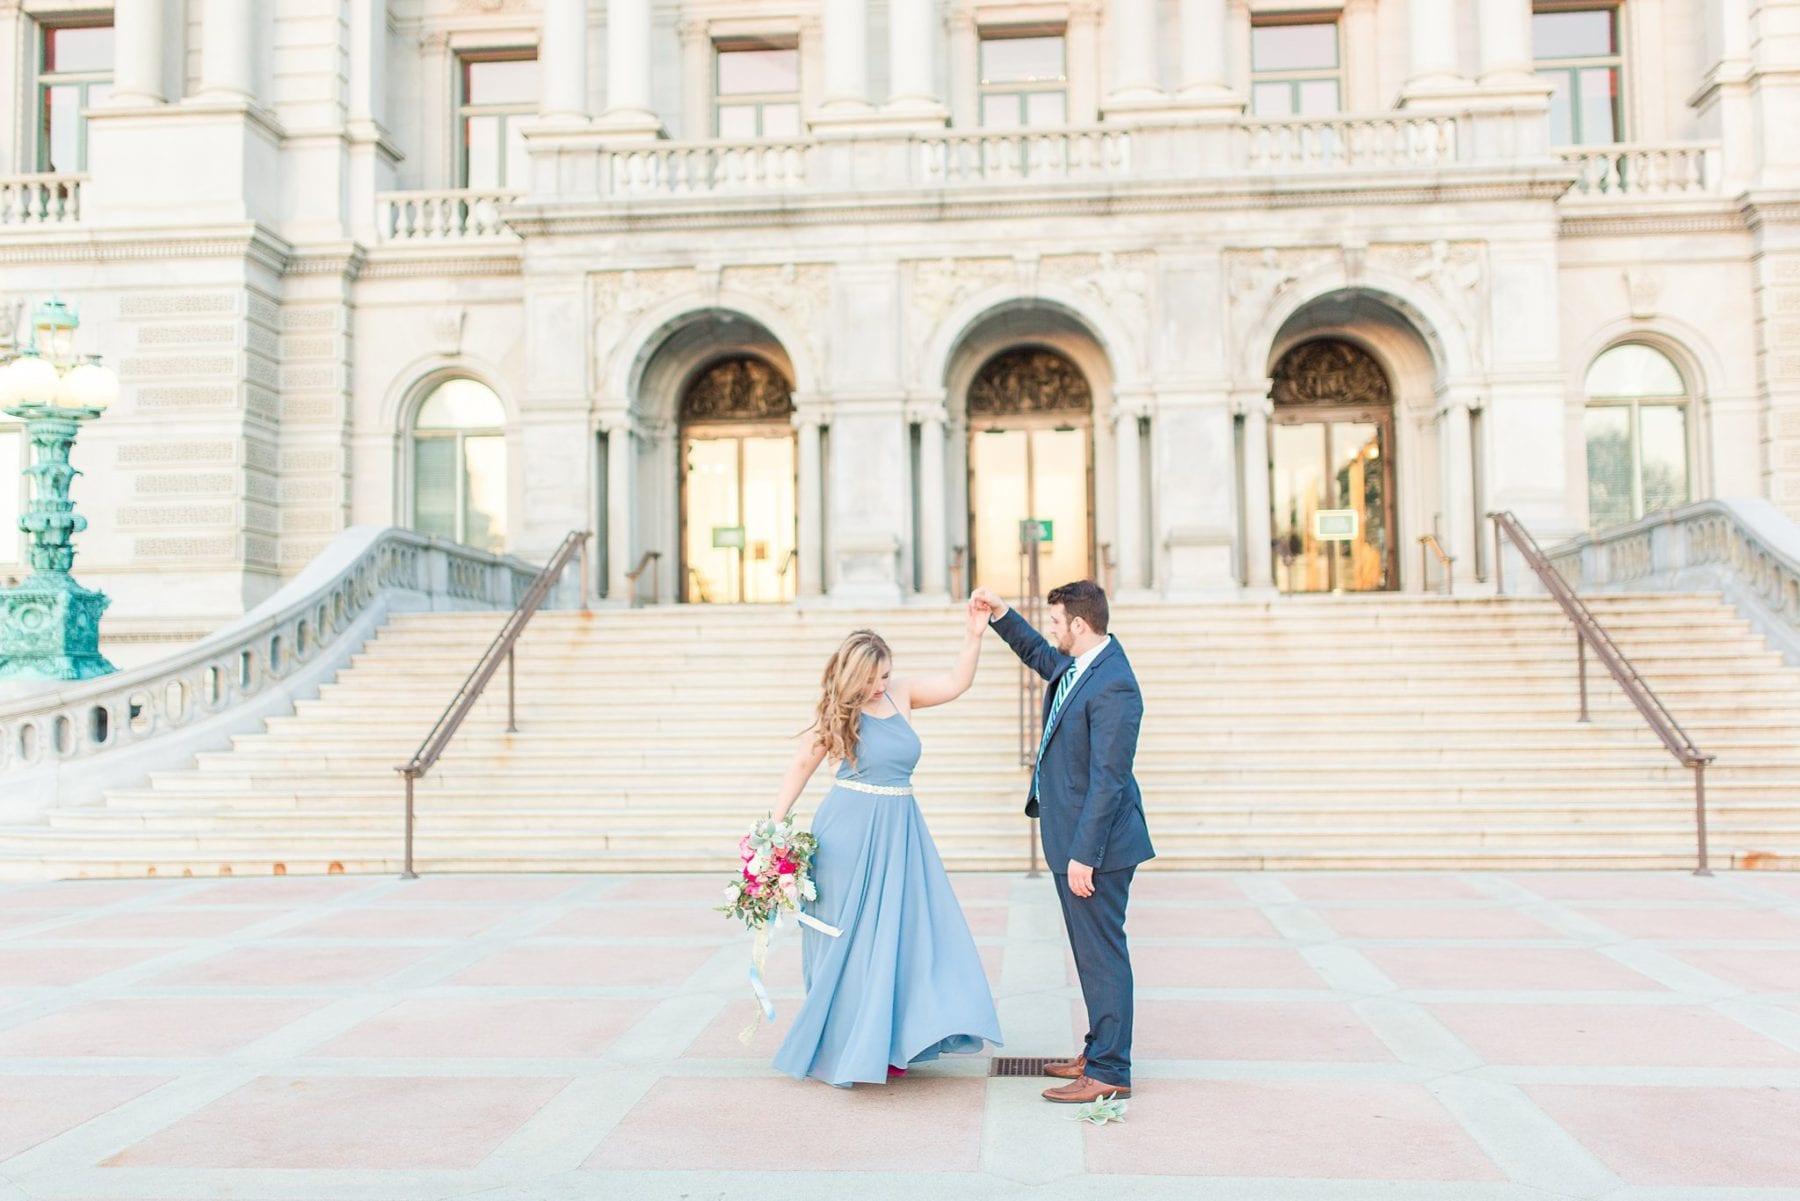 Capitol Hill Engagement Photos Kelly & Zach Washington DC Wedding Photographer Megan Kelsey Photography-326.jpg